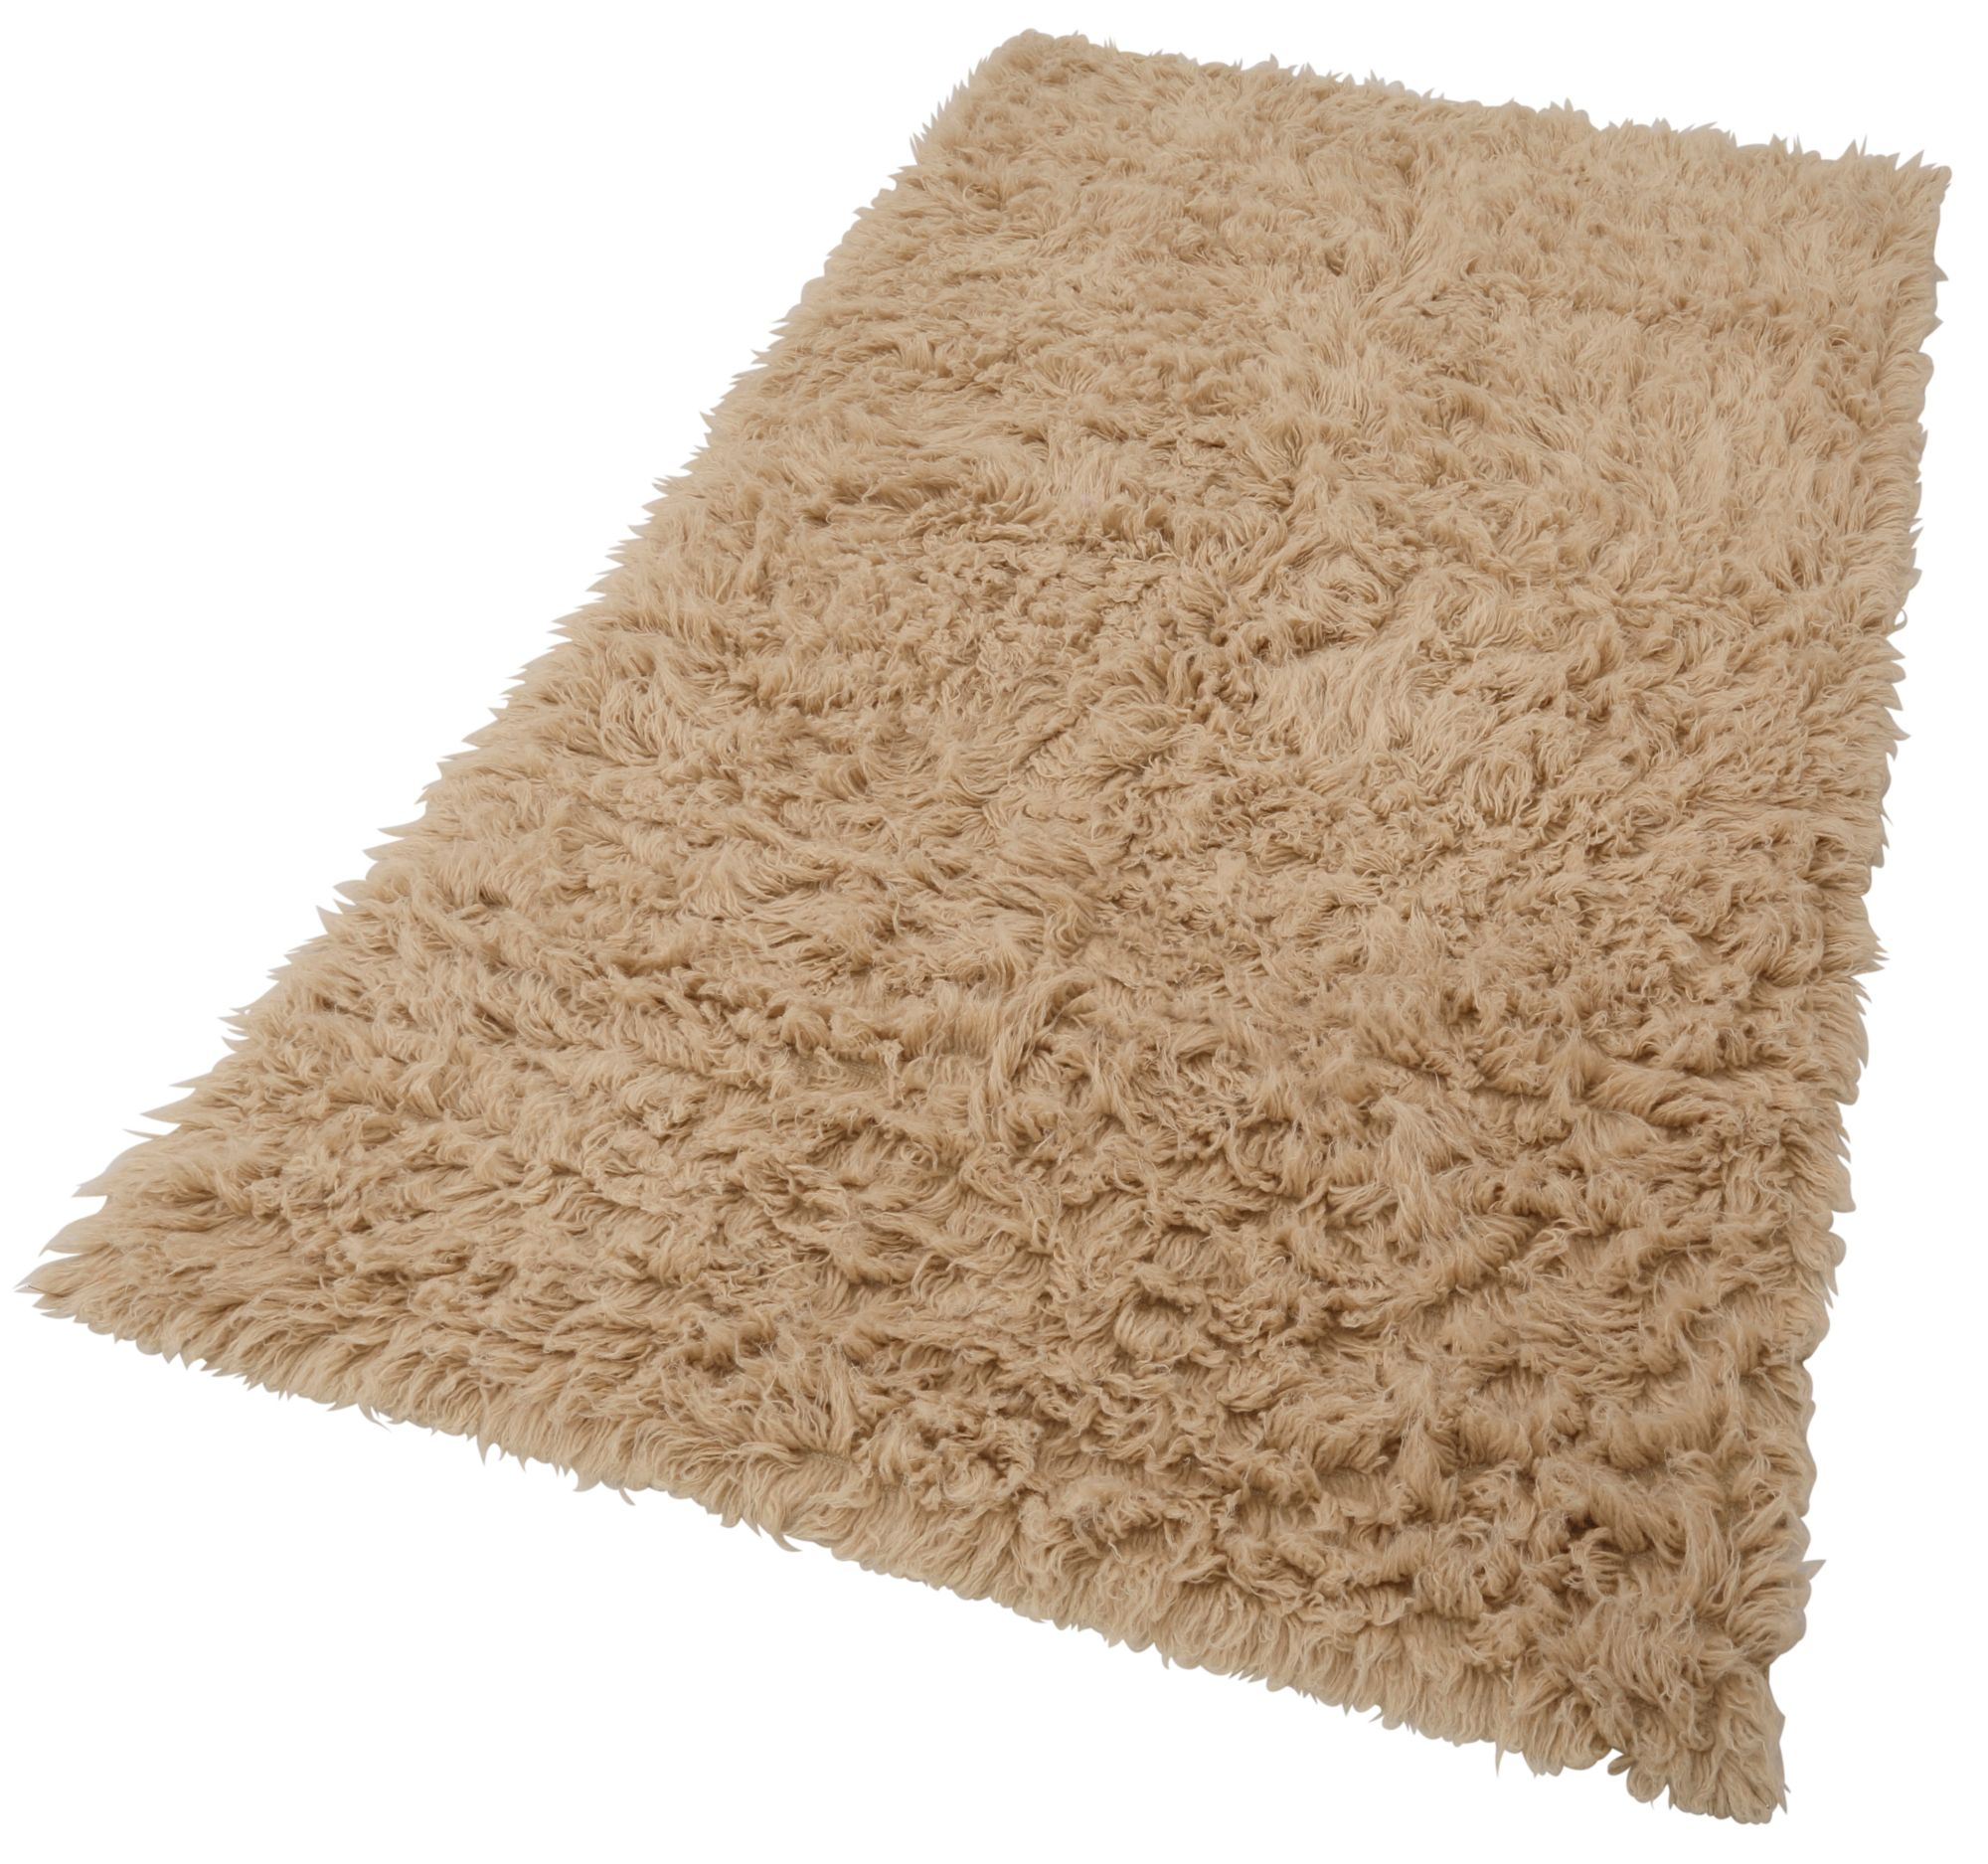 BÖING CARPET Fell-Teppich, Böing Carpet, »Flokati 1500 g«, handgearbeitet, Wolle